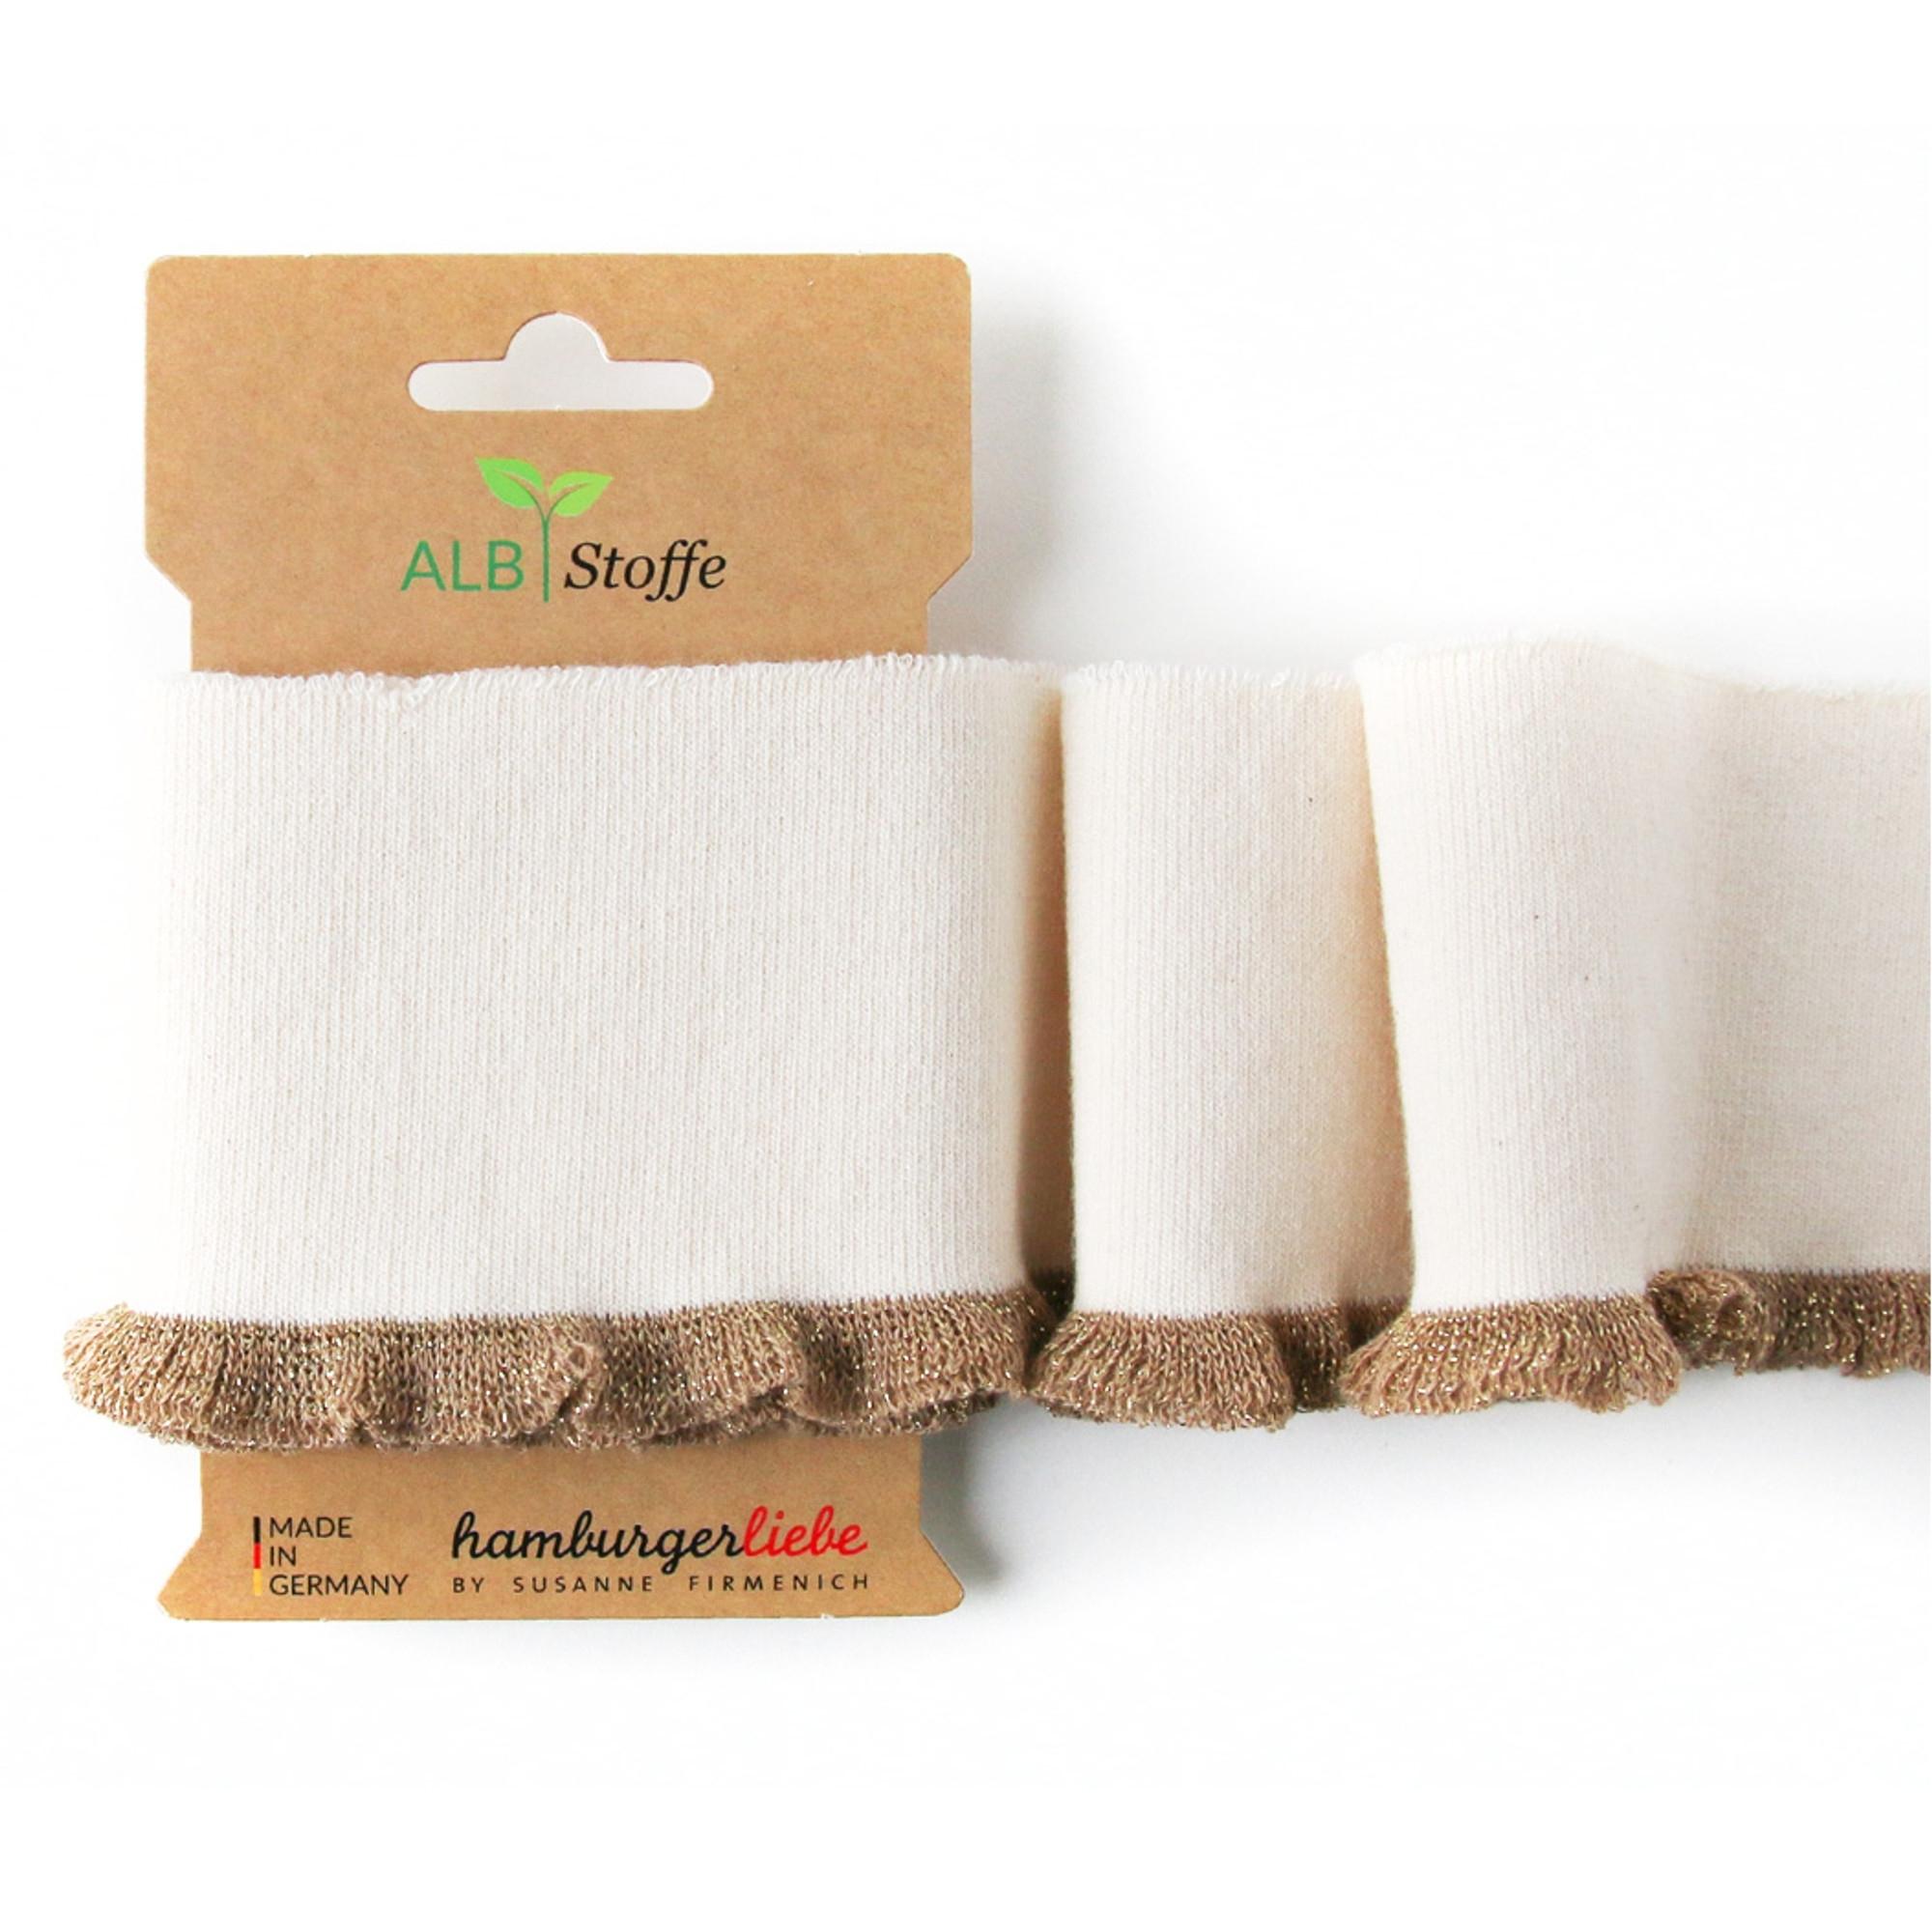 Wollweißes 'Cuff Me' Frill Bio-Baumwoll-Bündchen